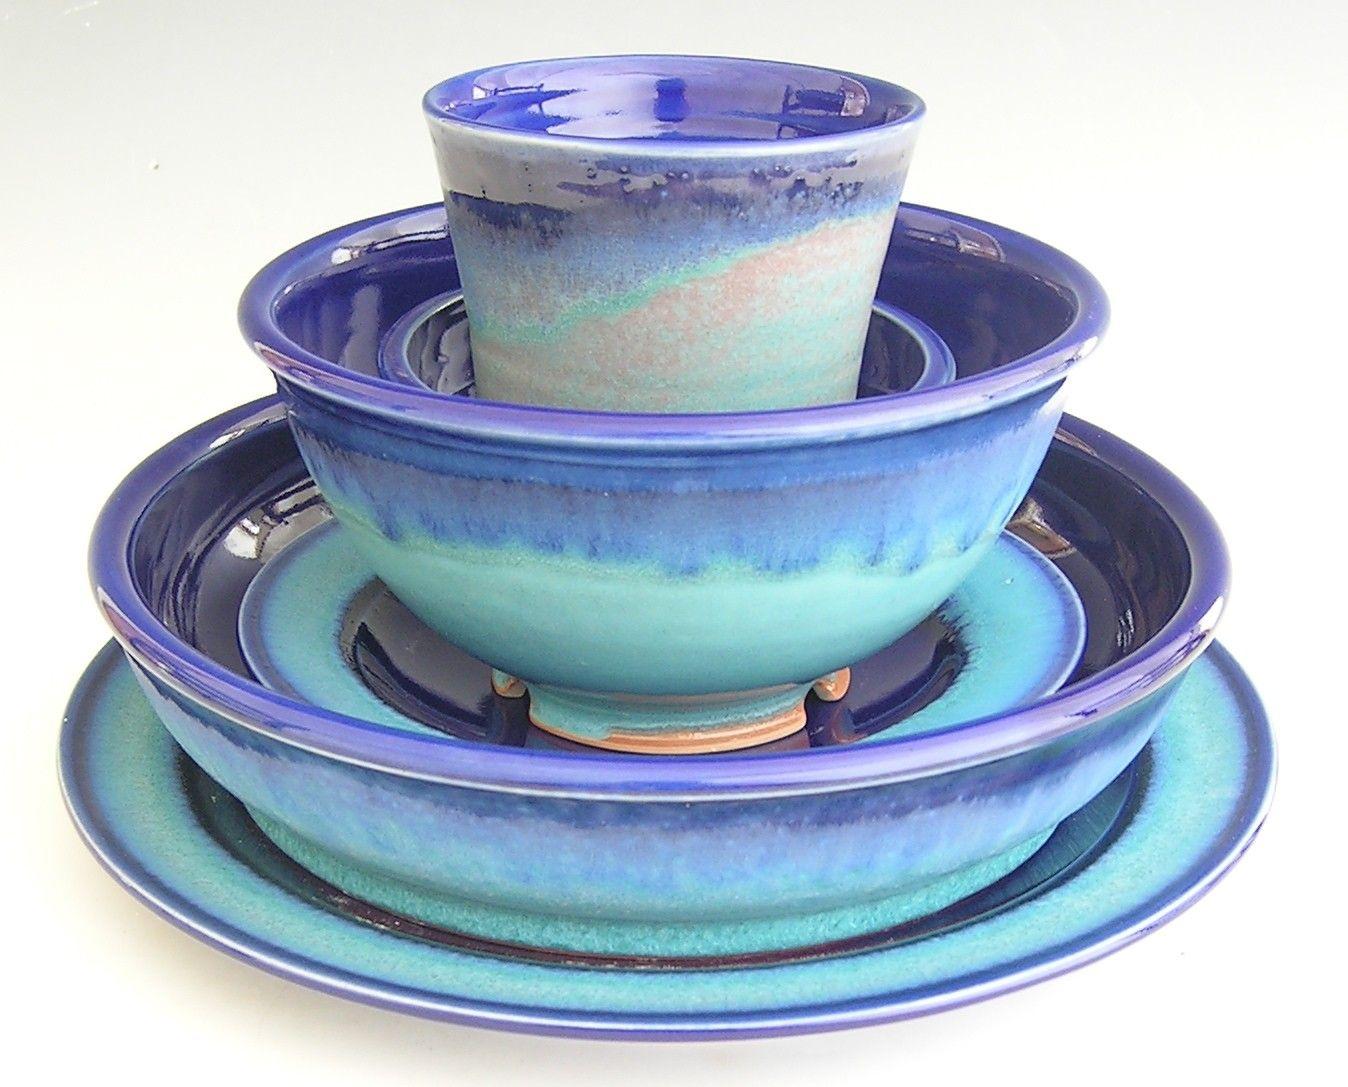 Modern Rustic Dinnerware Place Setting Handmade Ceramic Stoneware